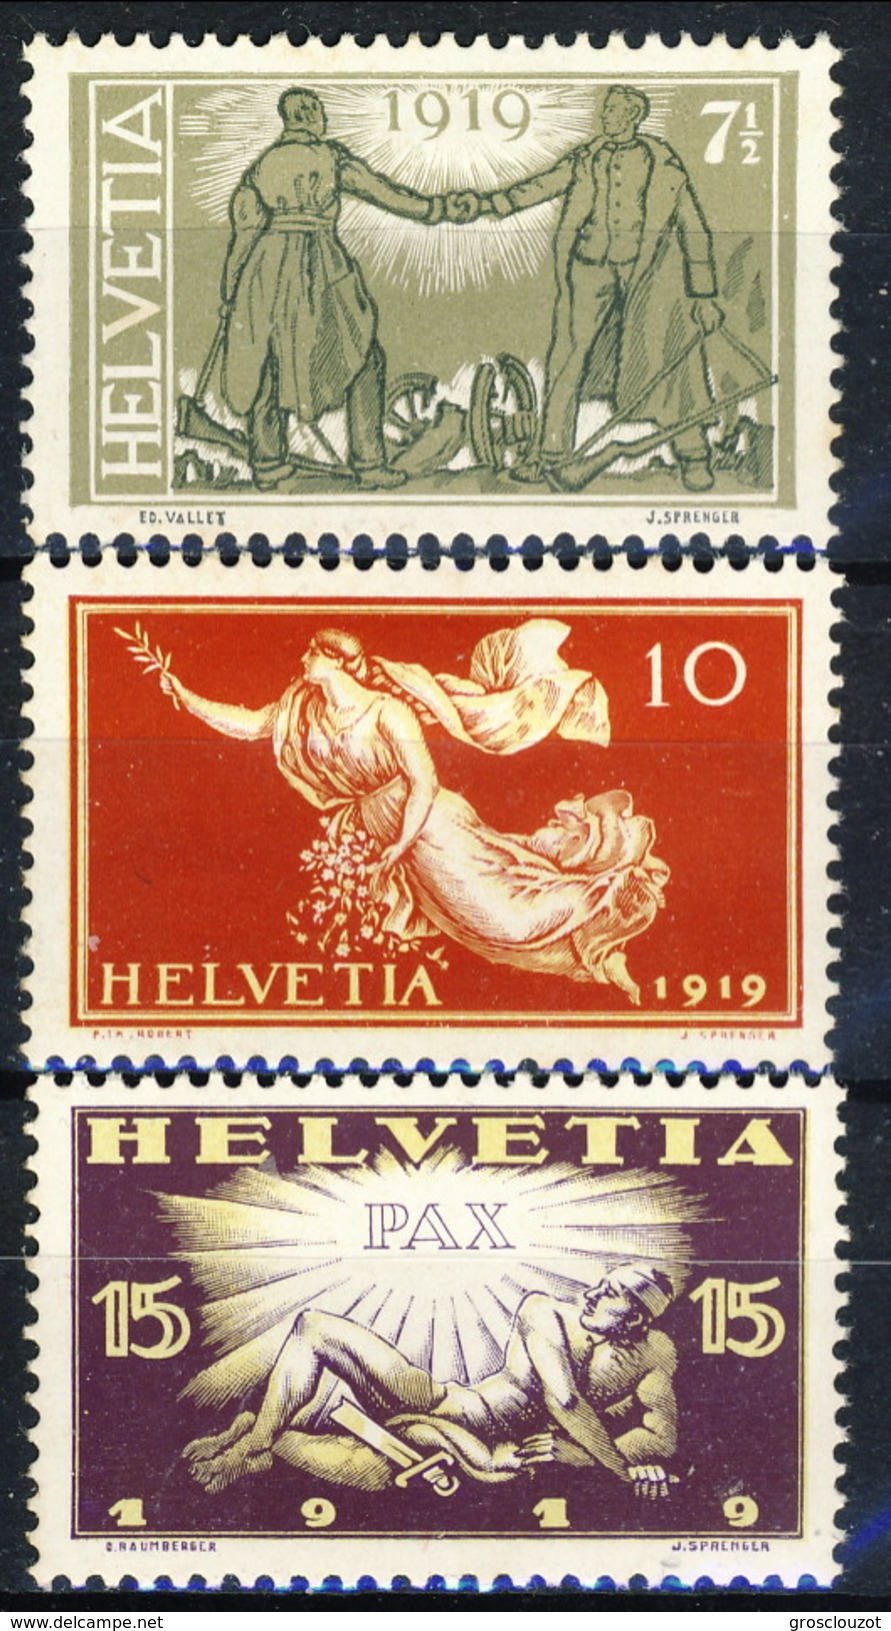 Svizzera 1919 Serie N. 170-172 Pace MNH Cat € 25 - Nuovi